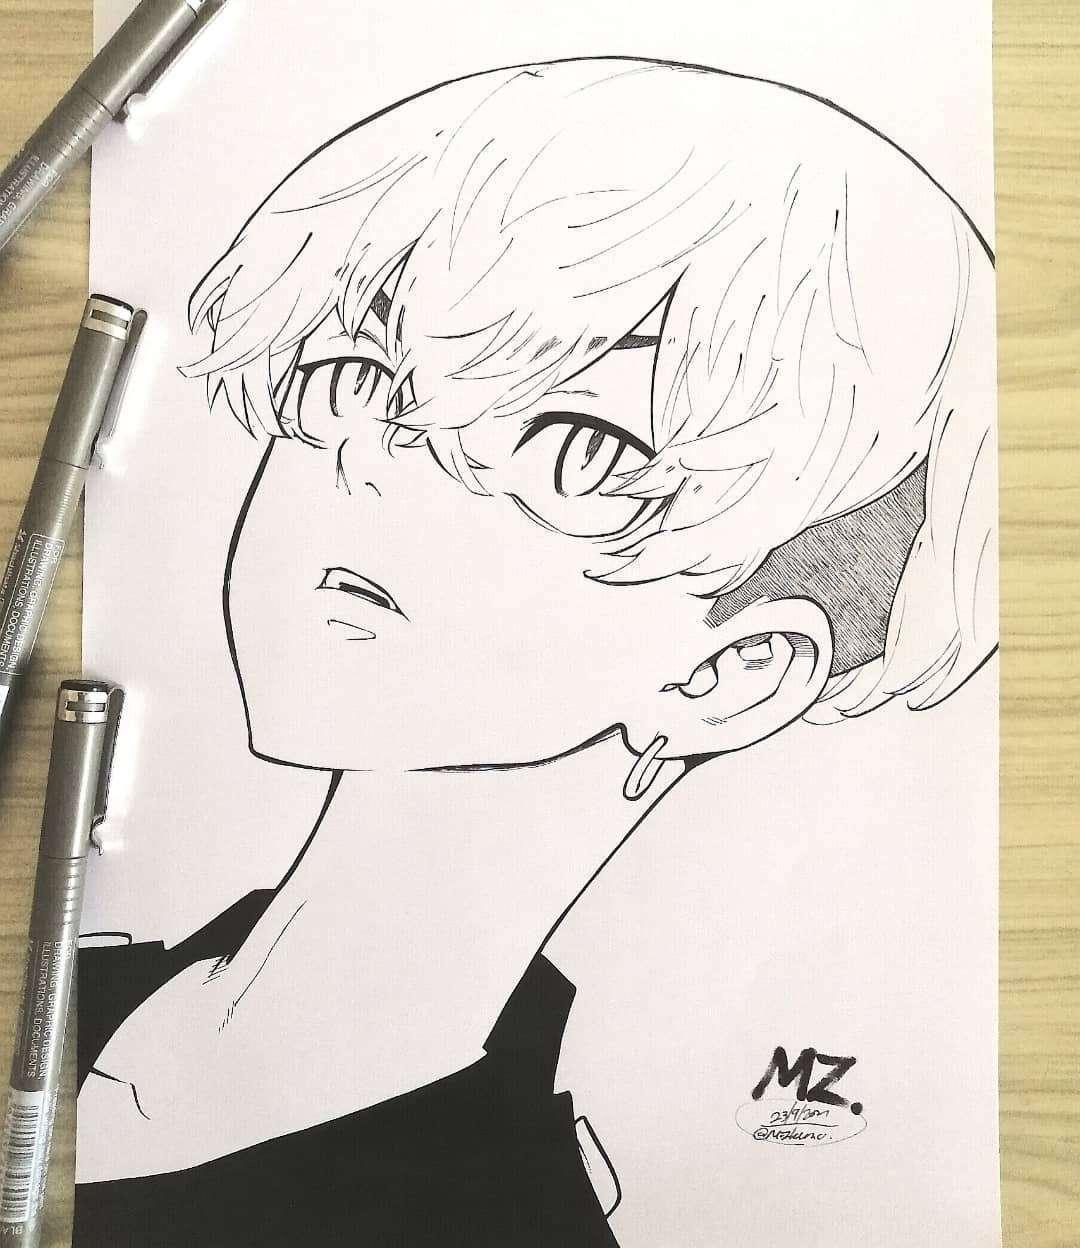 Chifuyu (Tokyo Revengers) by mozhemo Anime Art of the Week